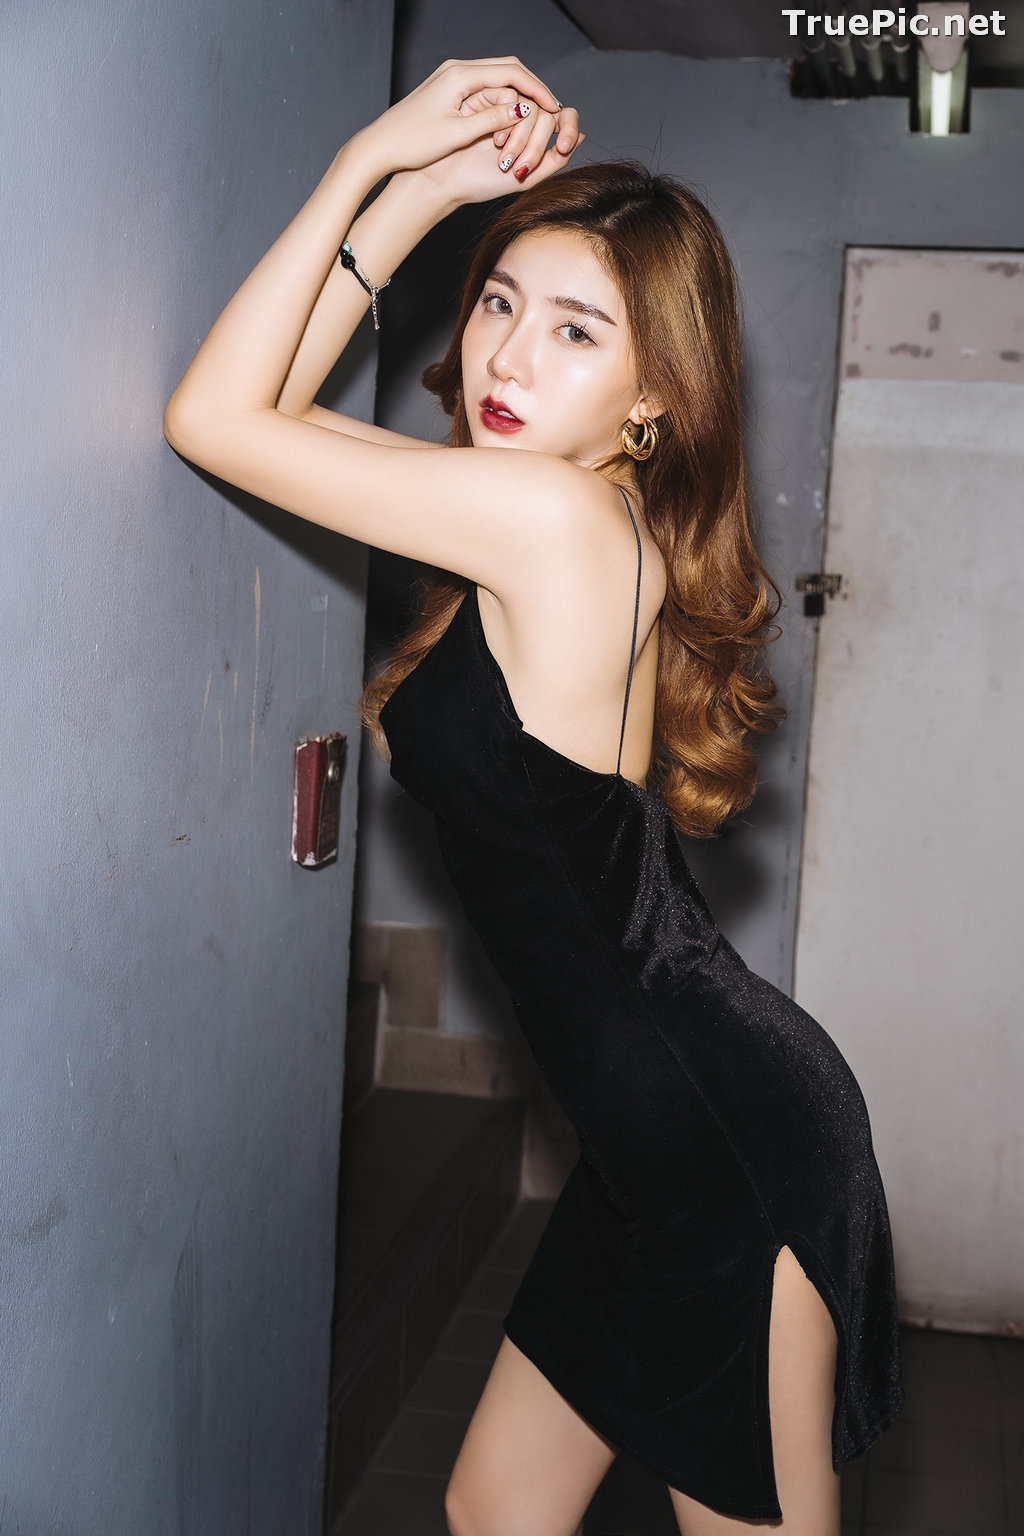 Image Thailand Model - Sasi Ngiunwan - Black For SiamNight - TruePic.net - Picture-31